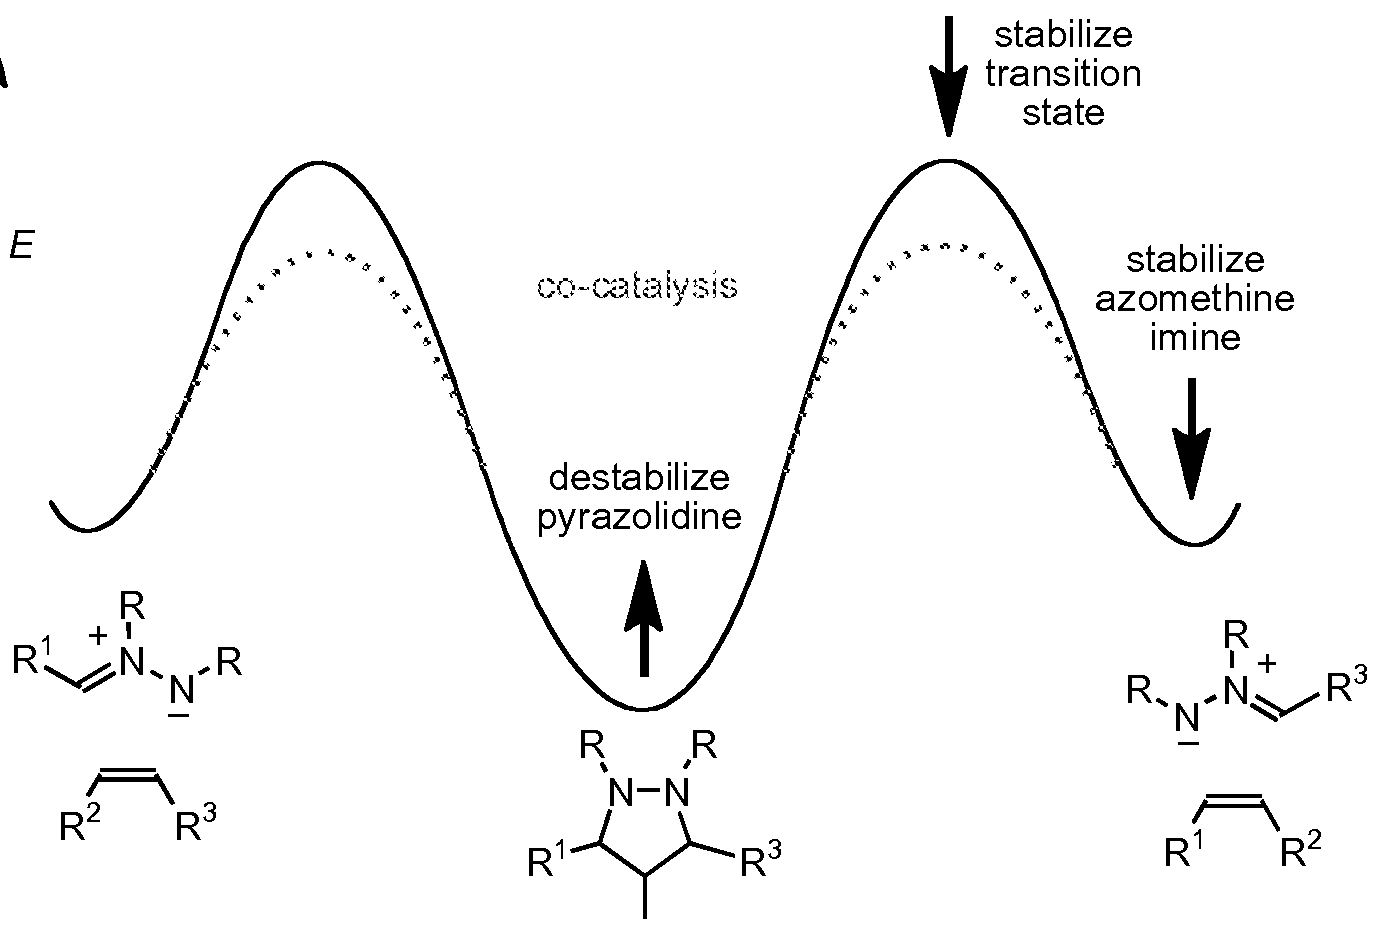 organocatalytic carbonyl-olefin metathesis Organocatalytic carbonyl-olefin metathesis allison k griffith, christine m vanos, and tristan h lambert (columbia university)j am chem soc 2012, 134, 18581.